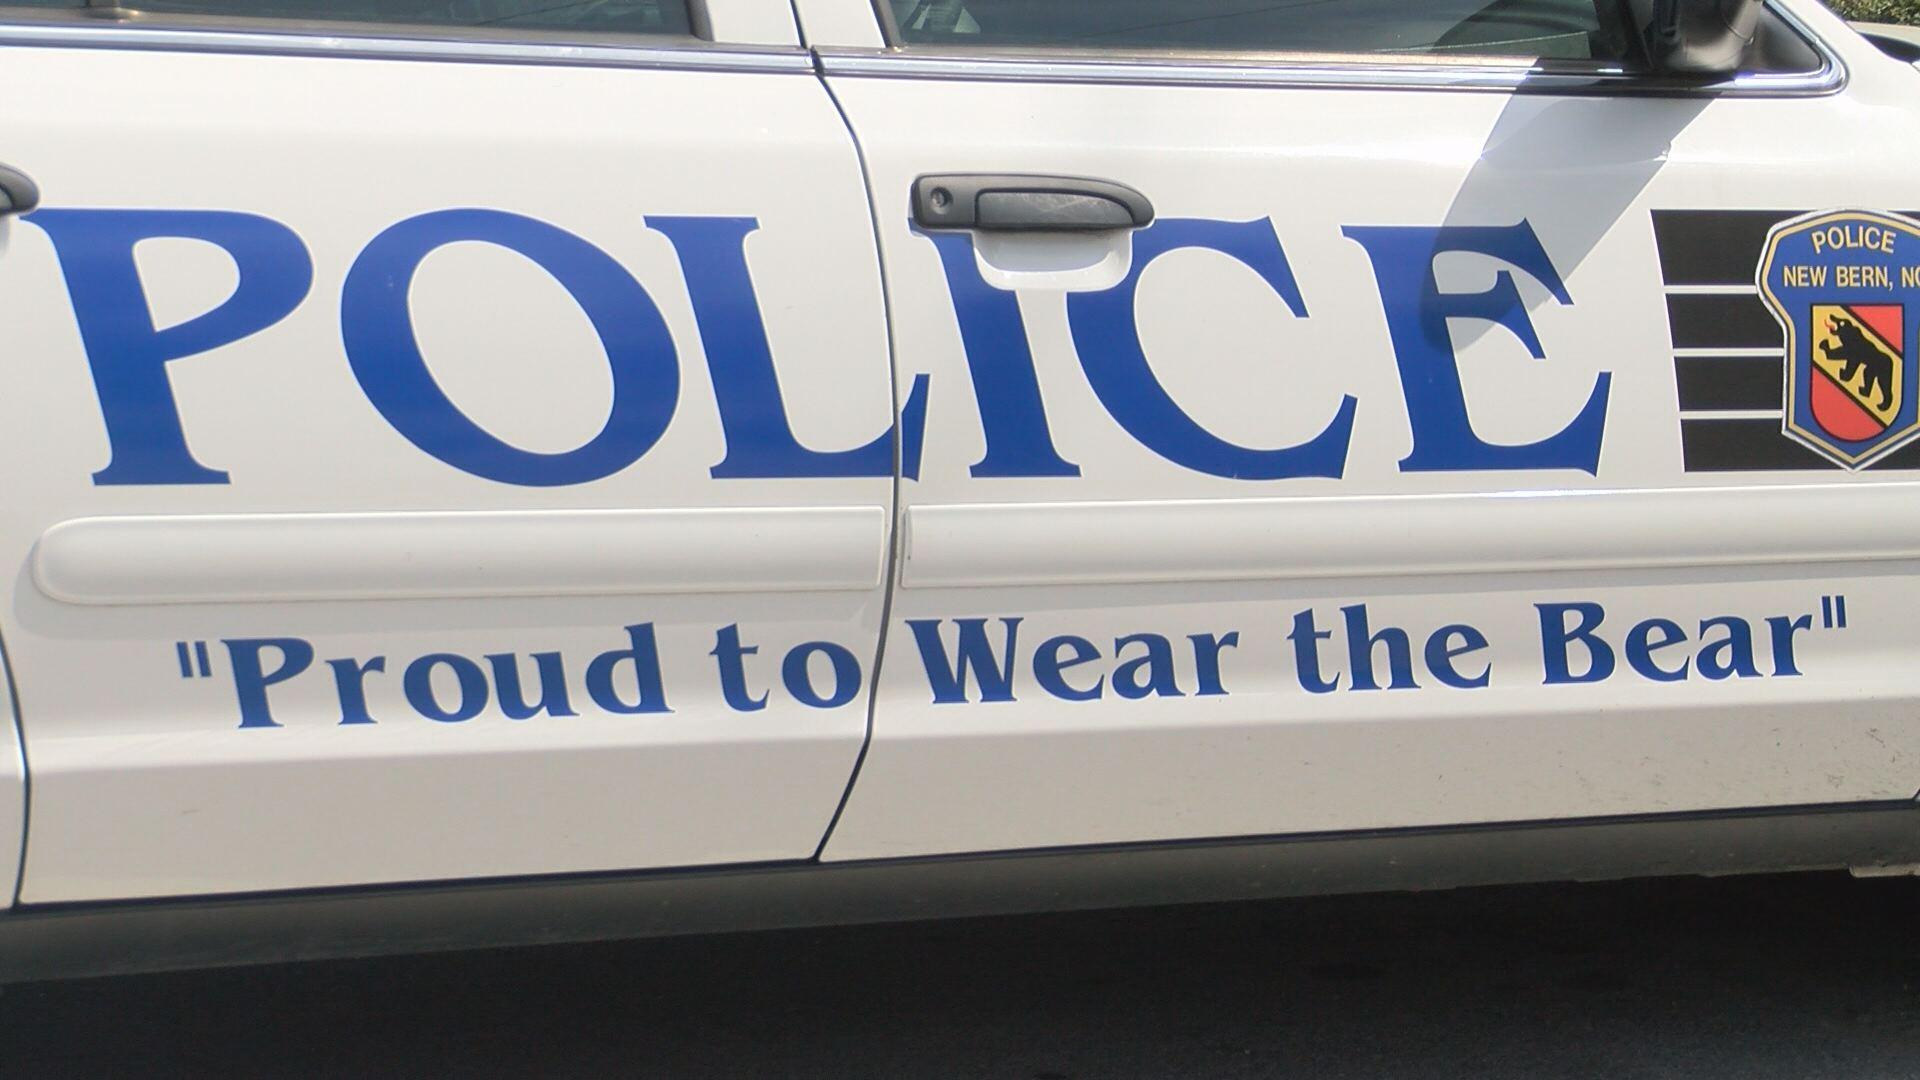 NEW BERN POLICE_183008